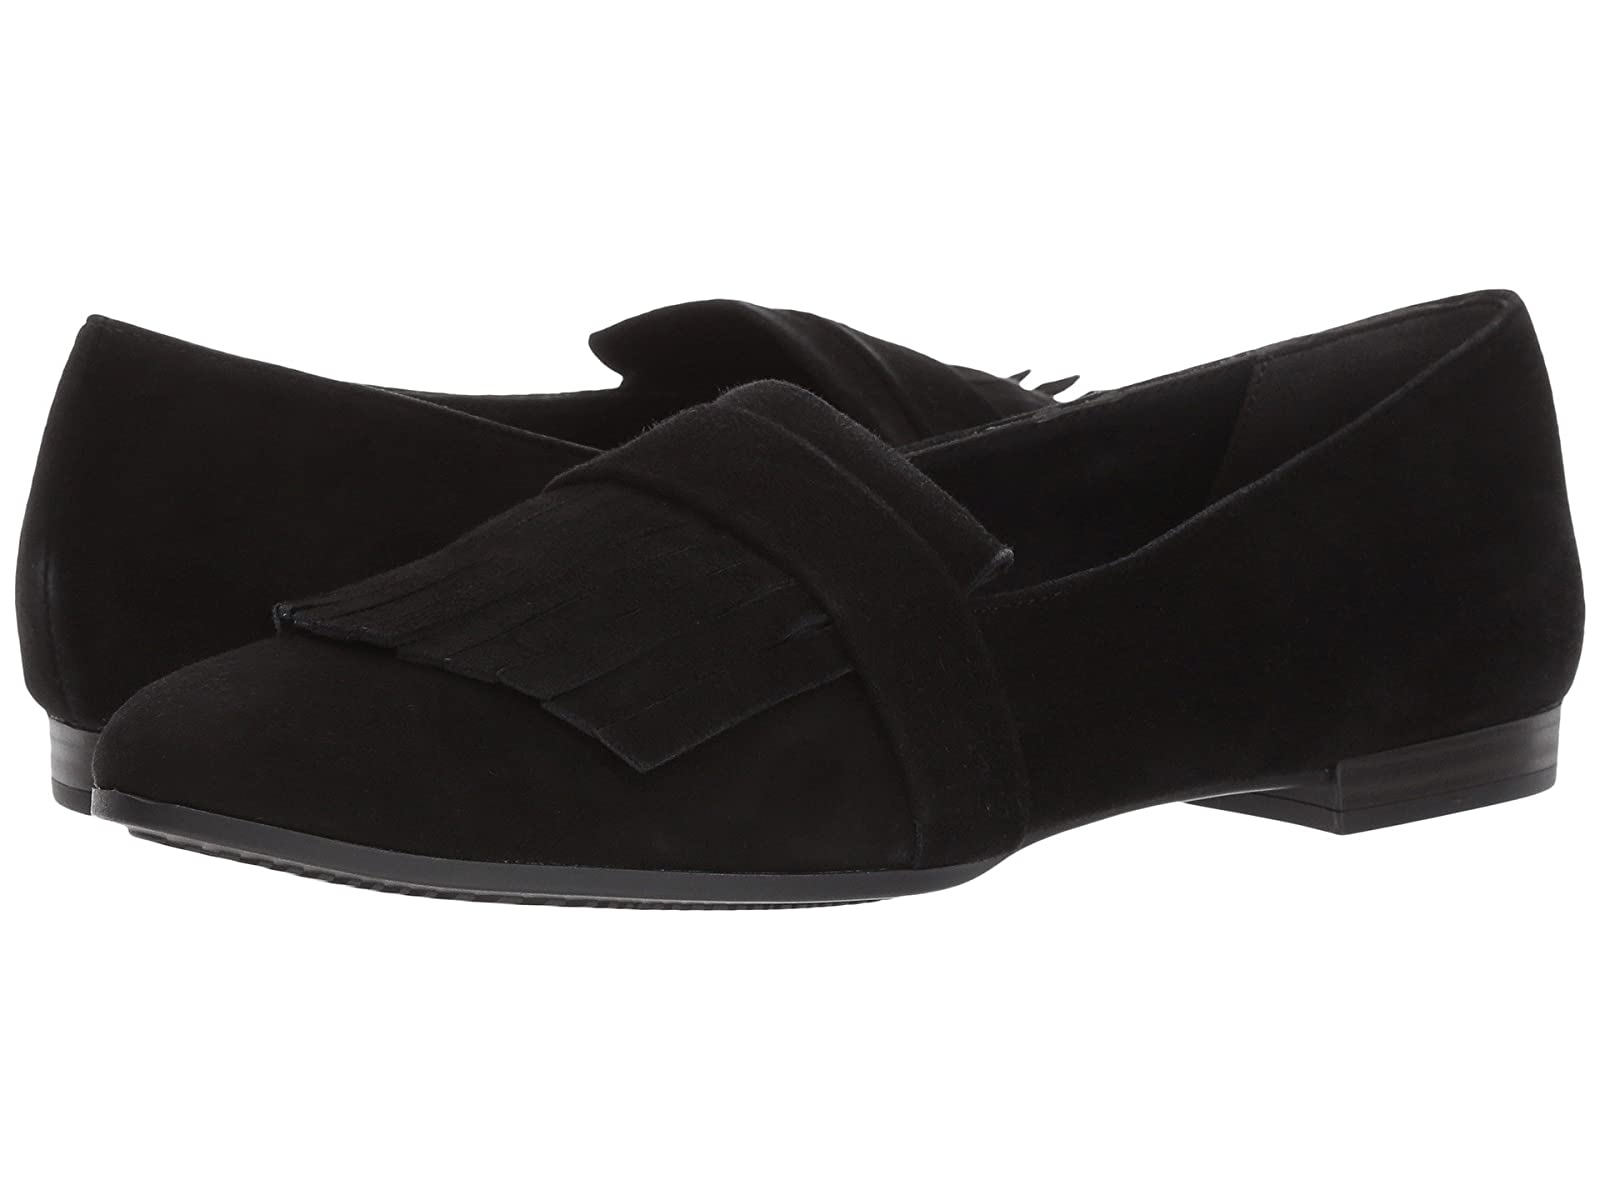 Tamaris Alena 1-1-24200-39Cheap and distinctive eye-catching shoes